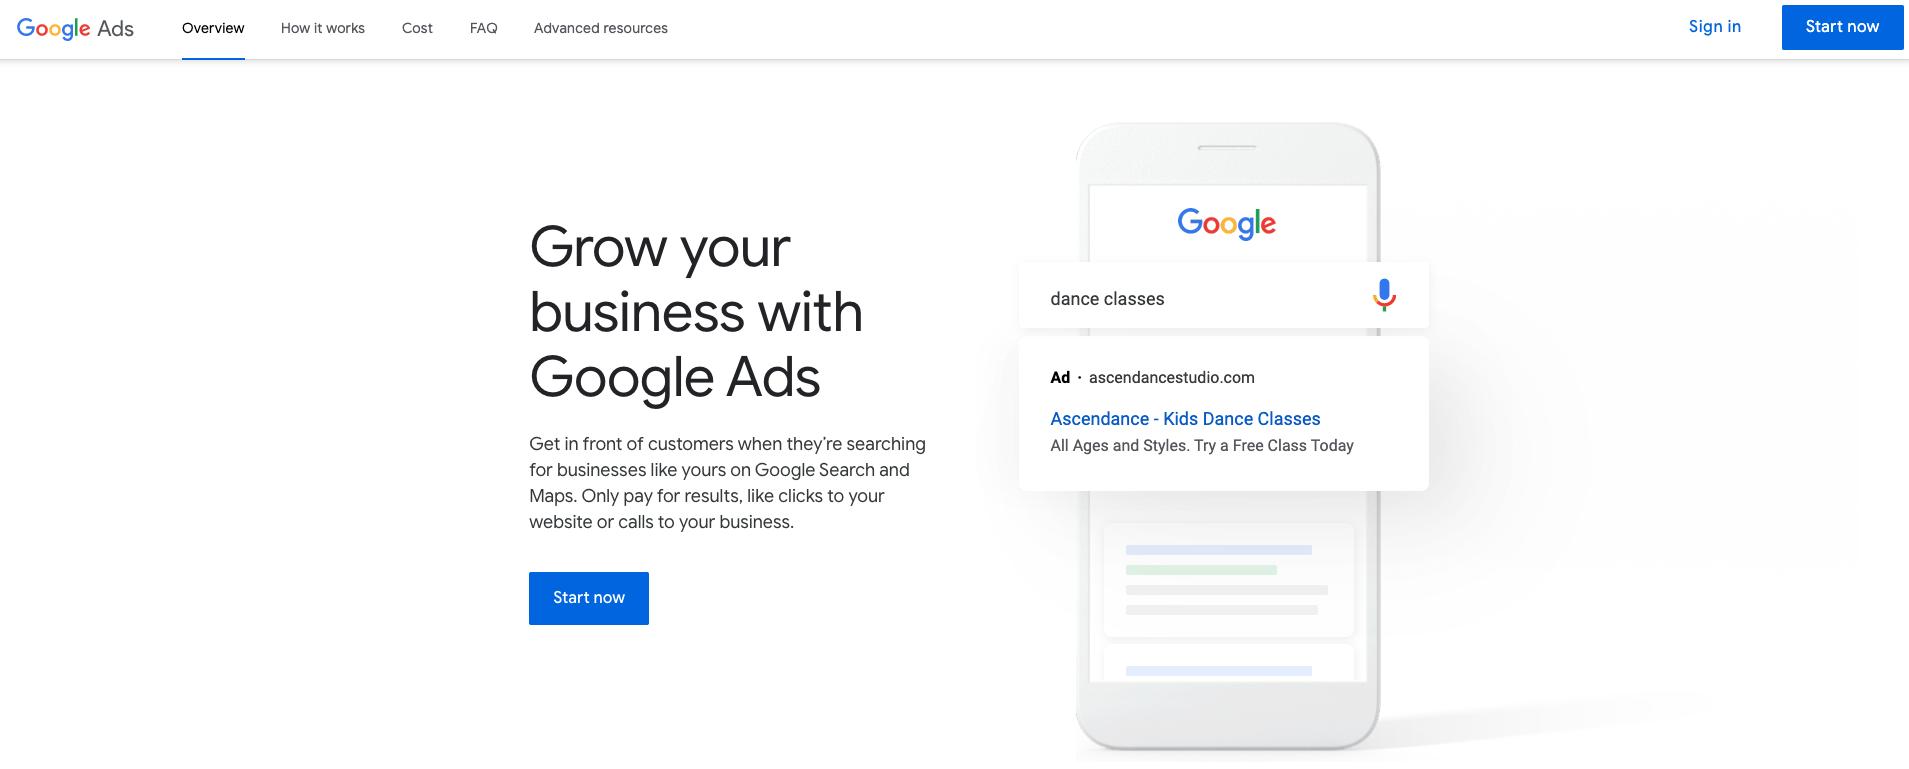 Google Ads start page